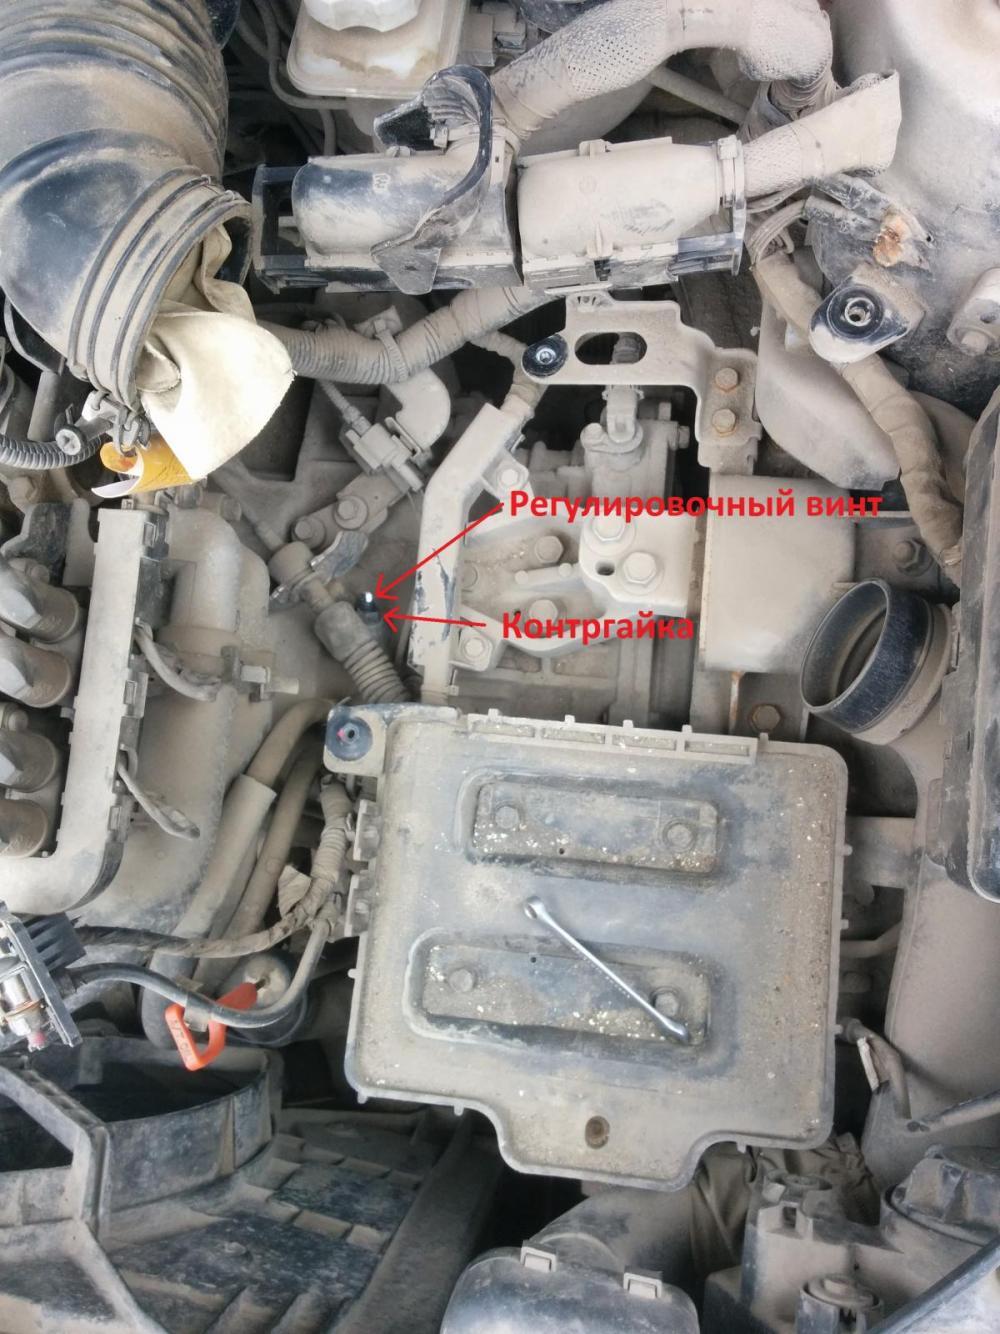 post-35534-0-61478000-1495519999_thumb.jpg